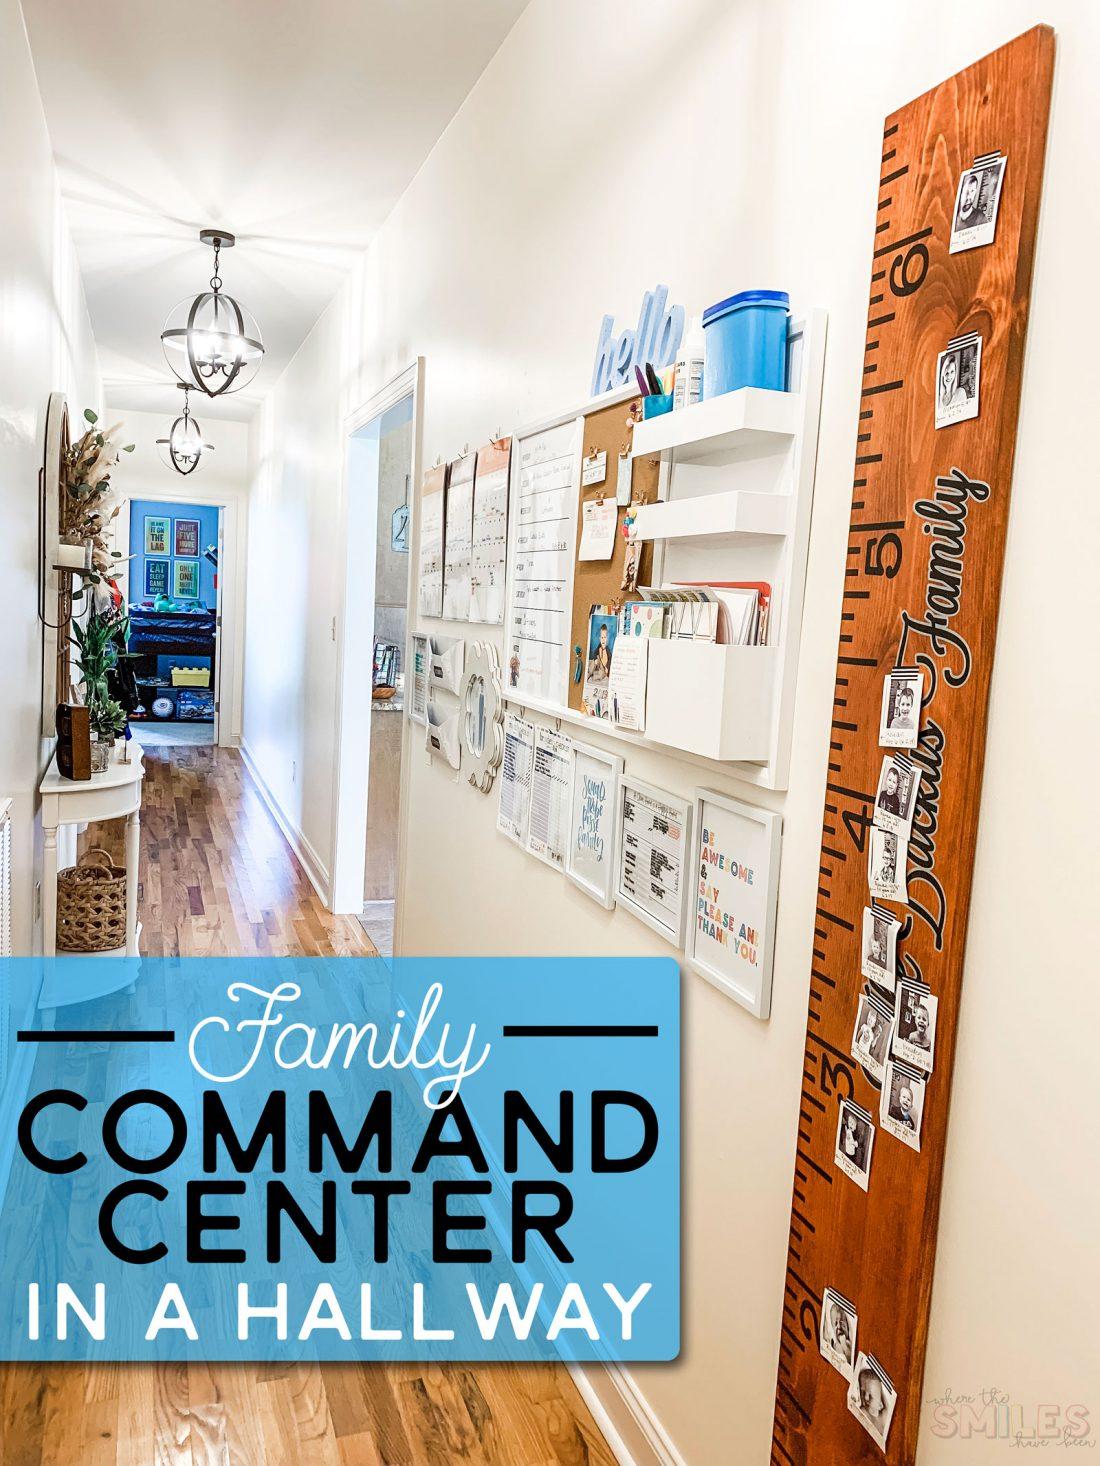 Hallway Family Command Center!